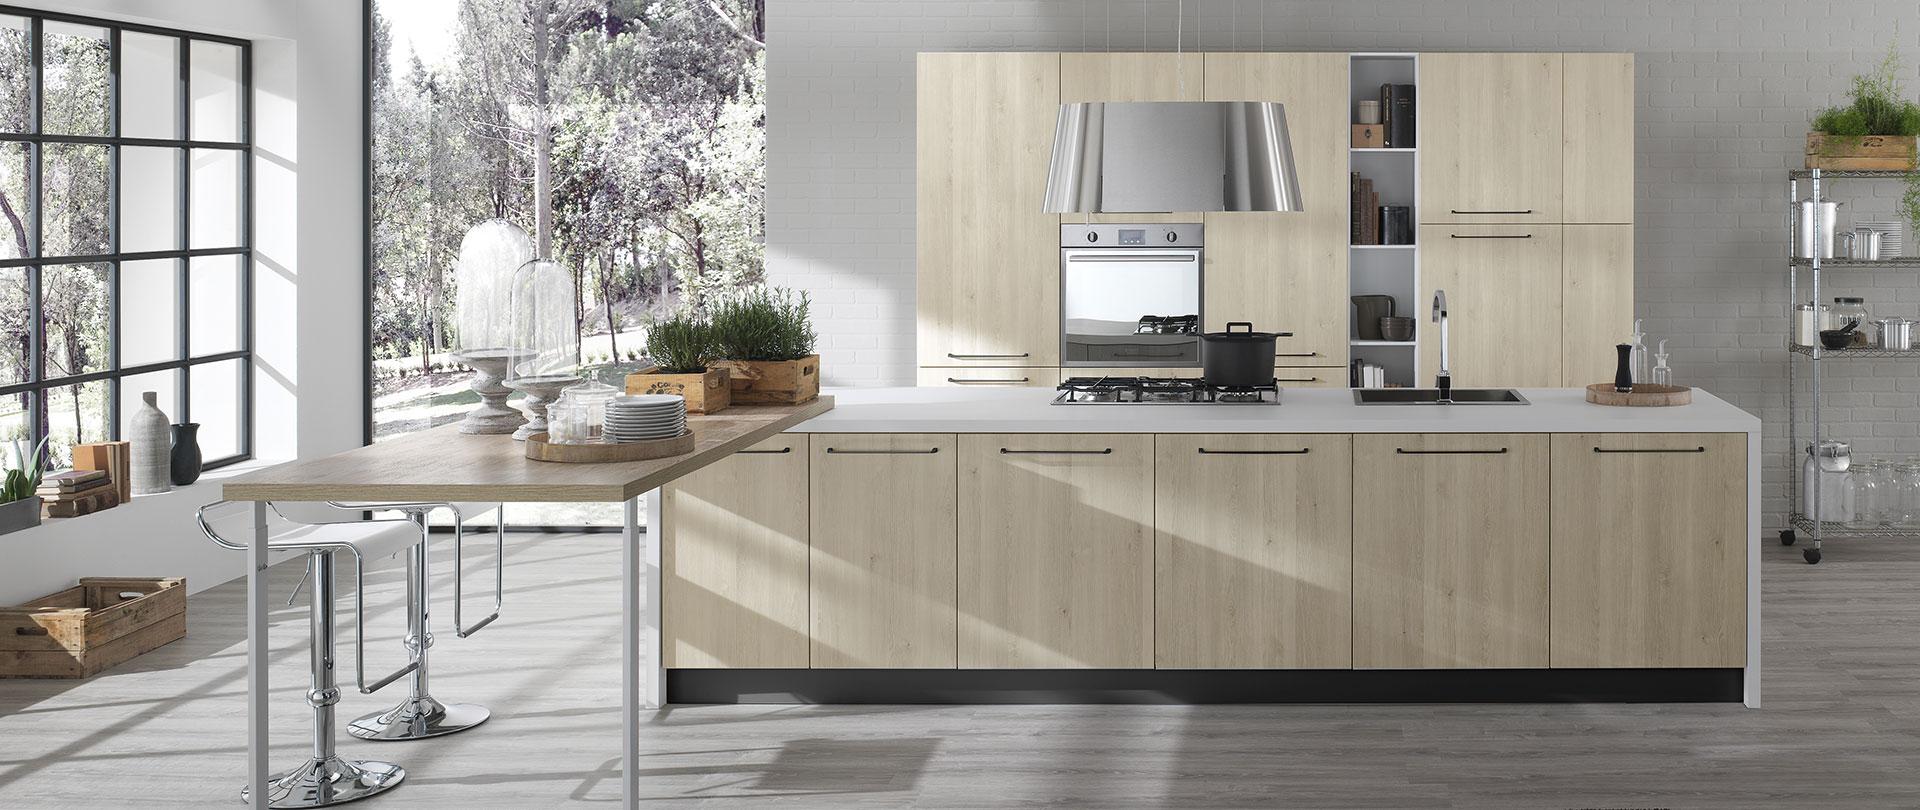 evo cucina aurora_rovere beige